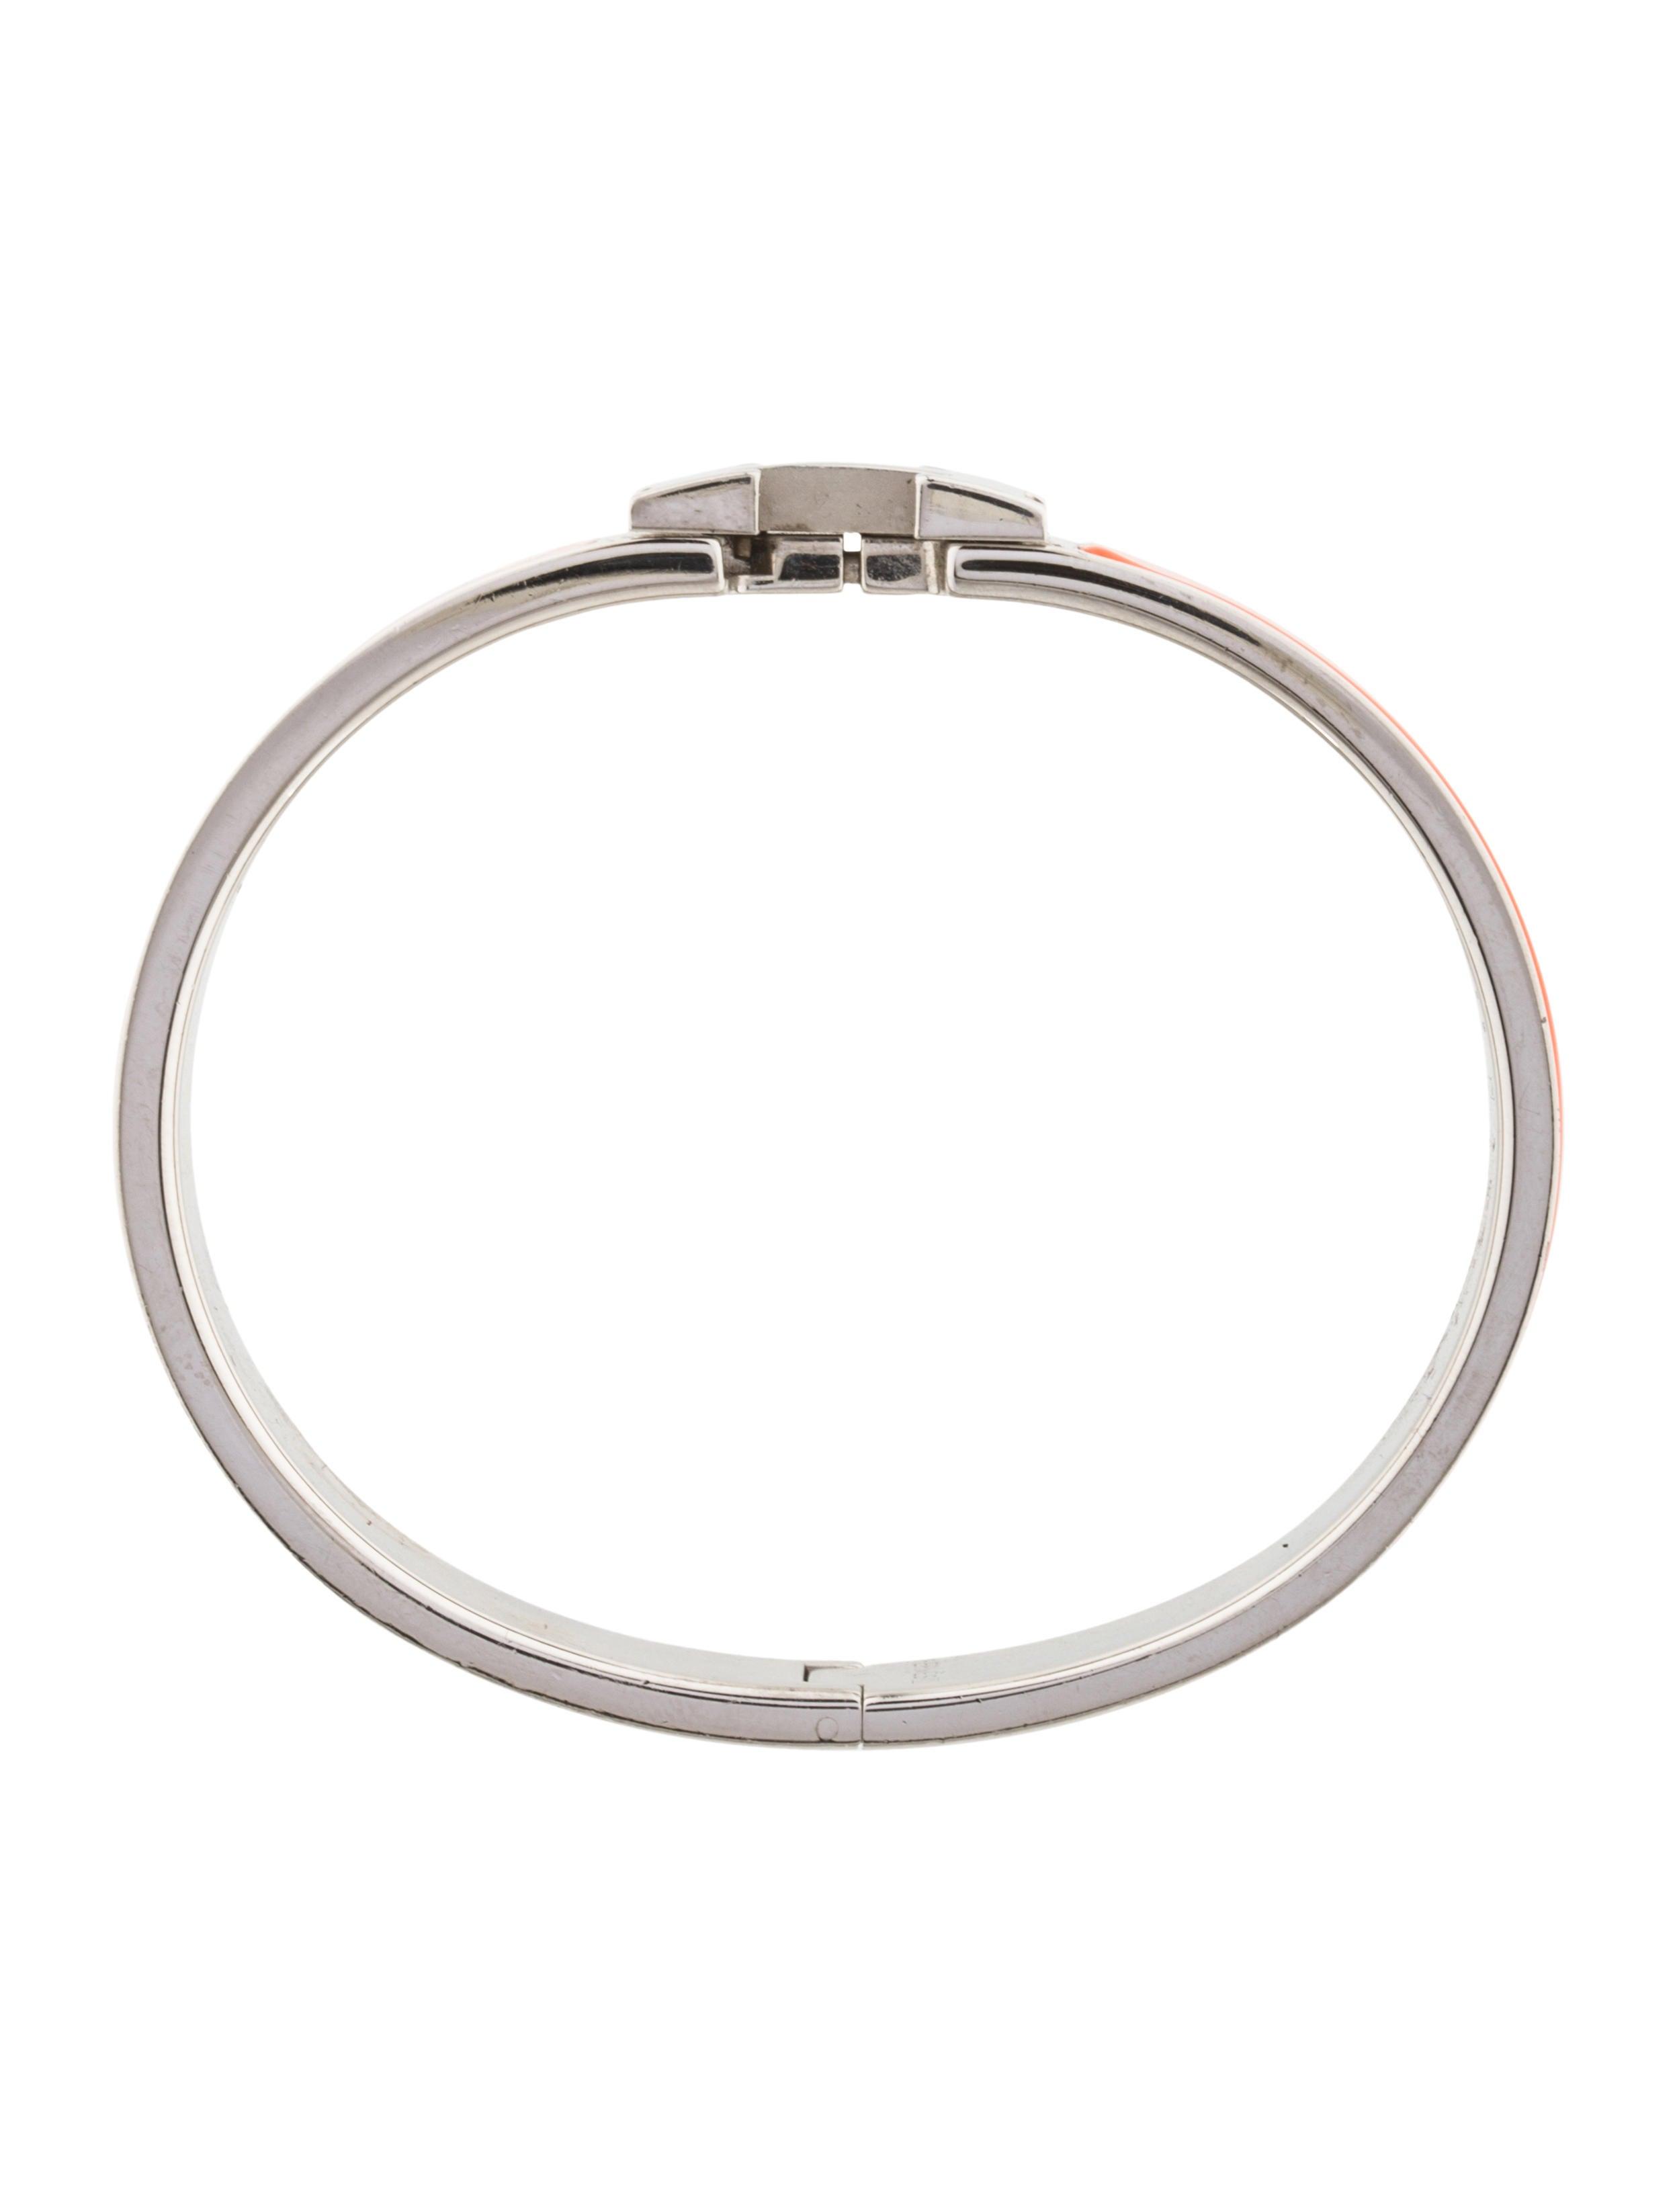 herm s narrow clic clac h bracelet bracelets her95544. Black Bedroom Furniture Sets. Home Design Ideas